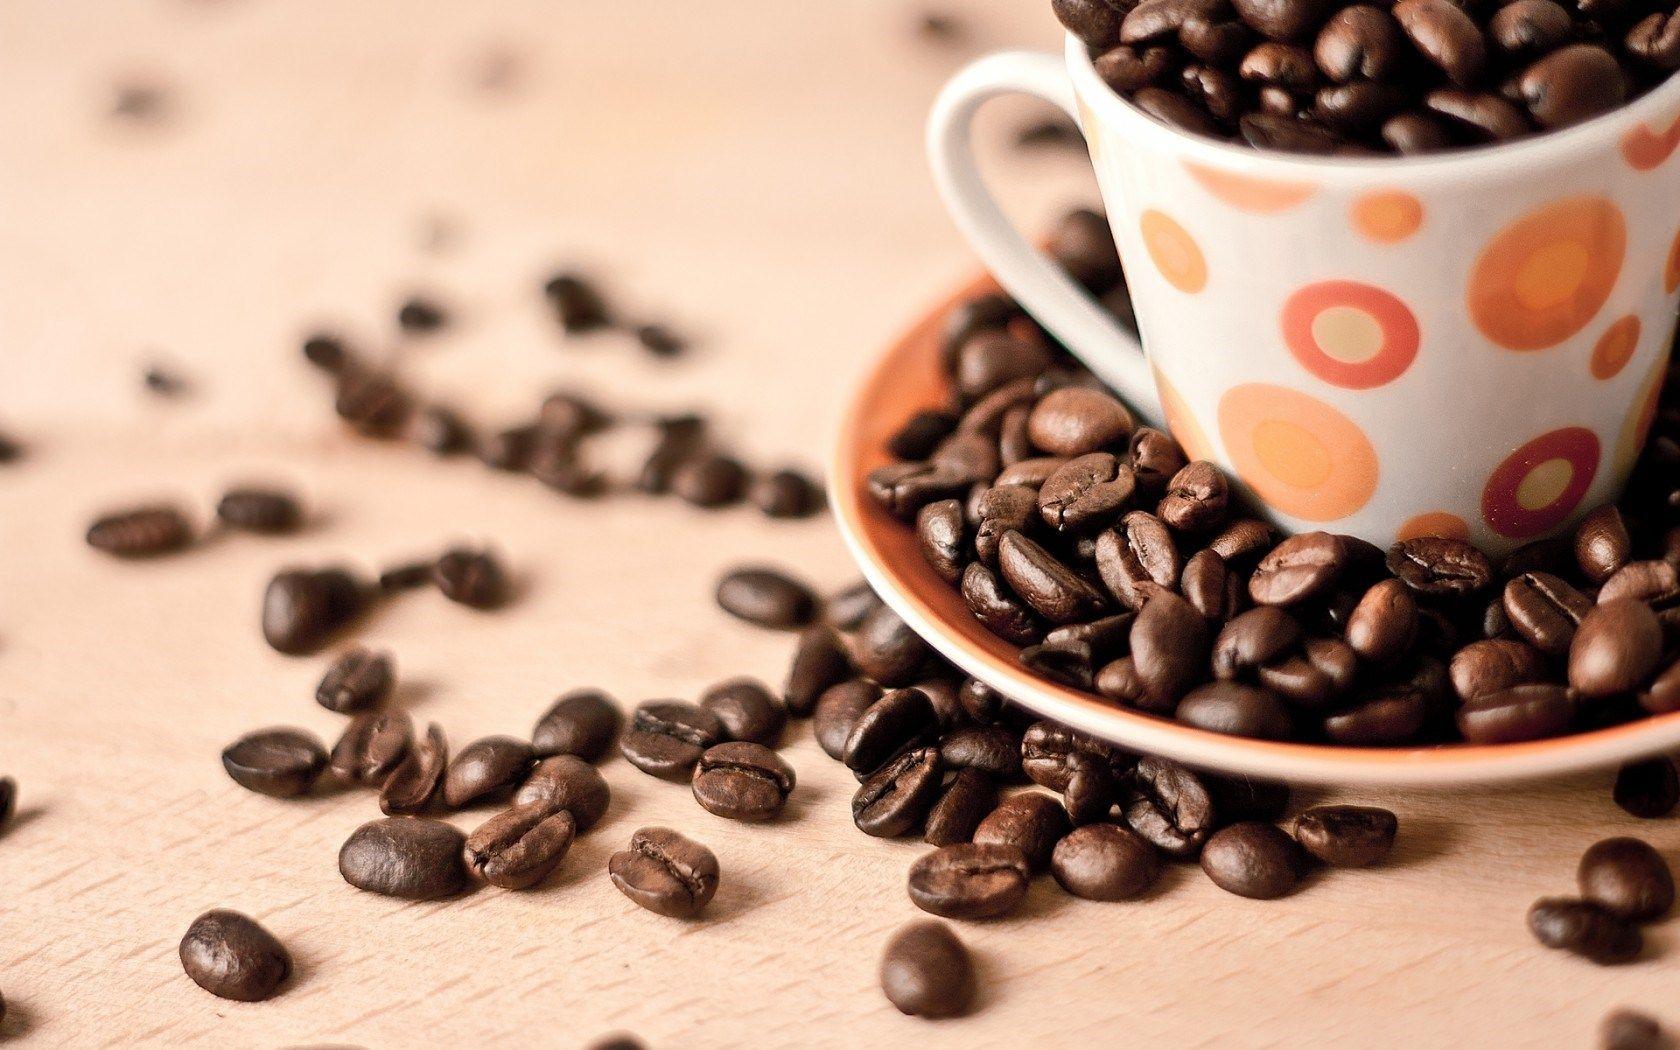 Обои coffee beans, coffee, wood, кофе, чашки, кофейные зёрна. Еда foto 15